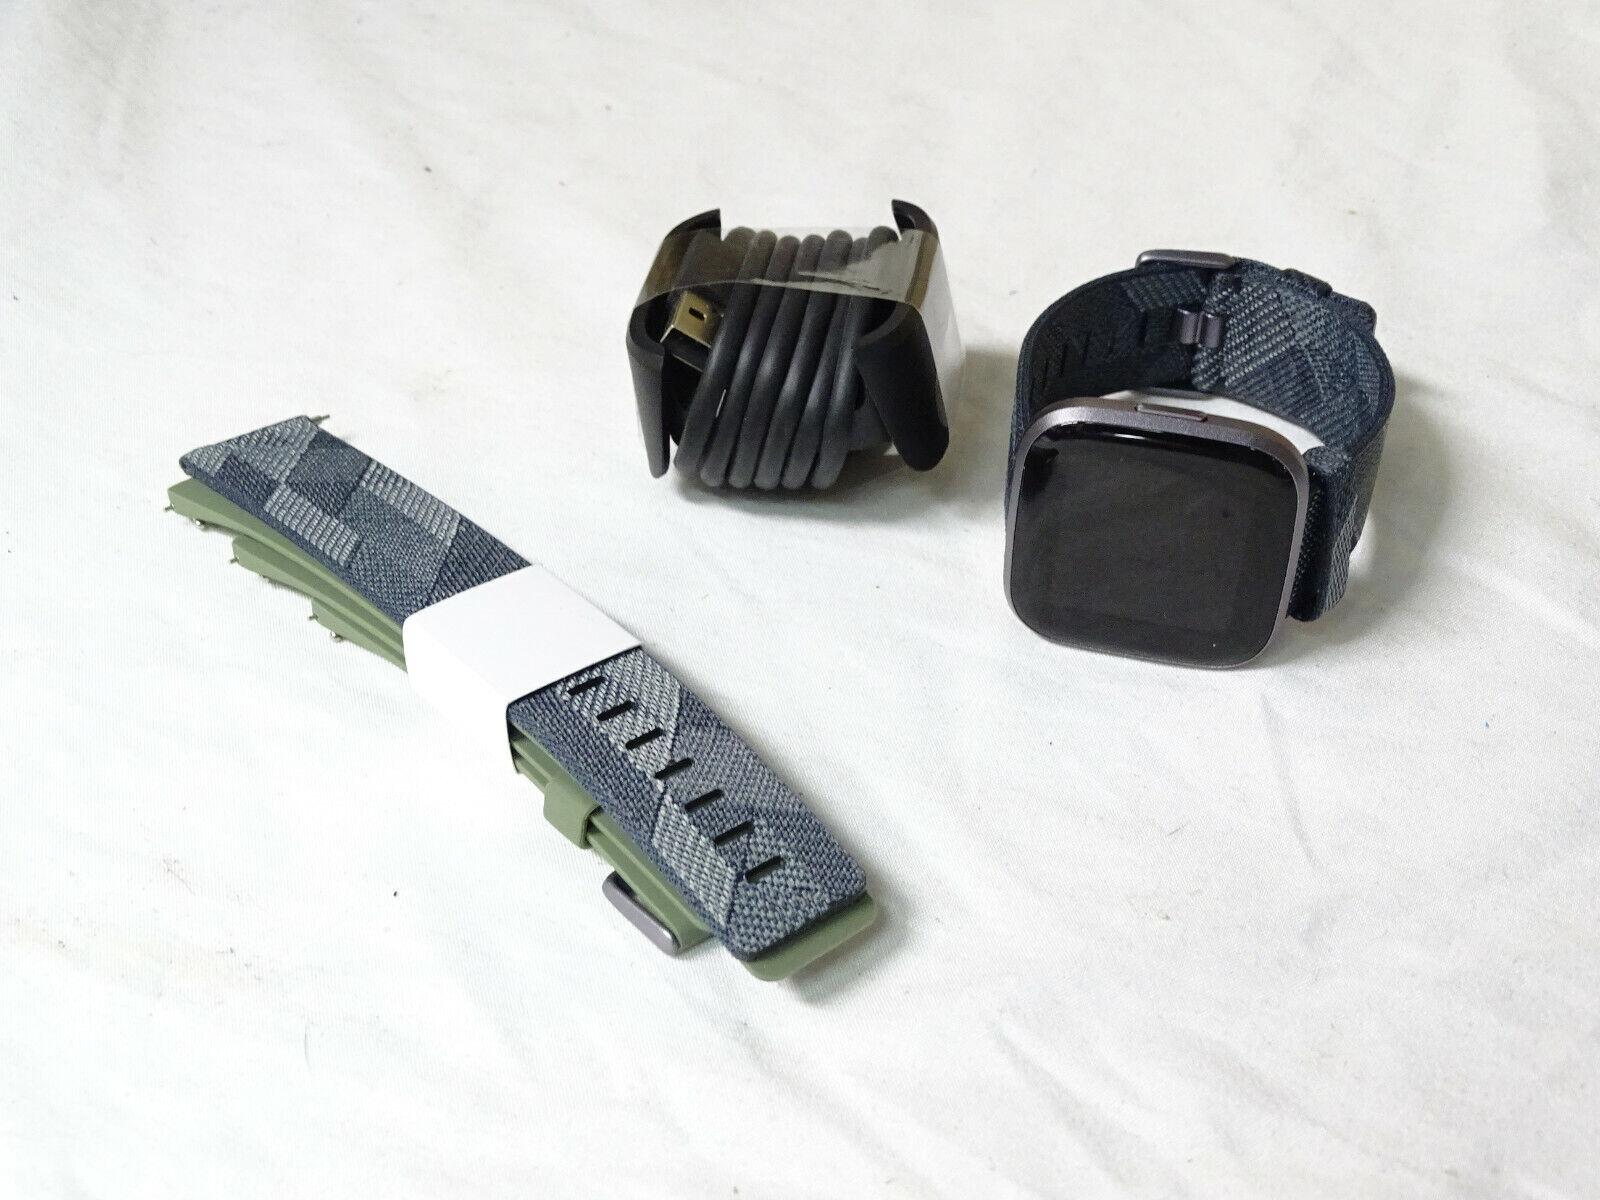 versa 2 fb507 smartwatch fitness tracker black